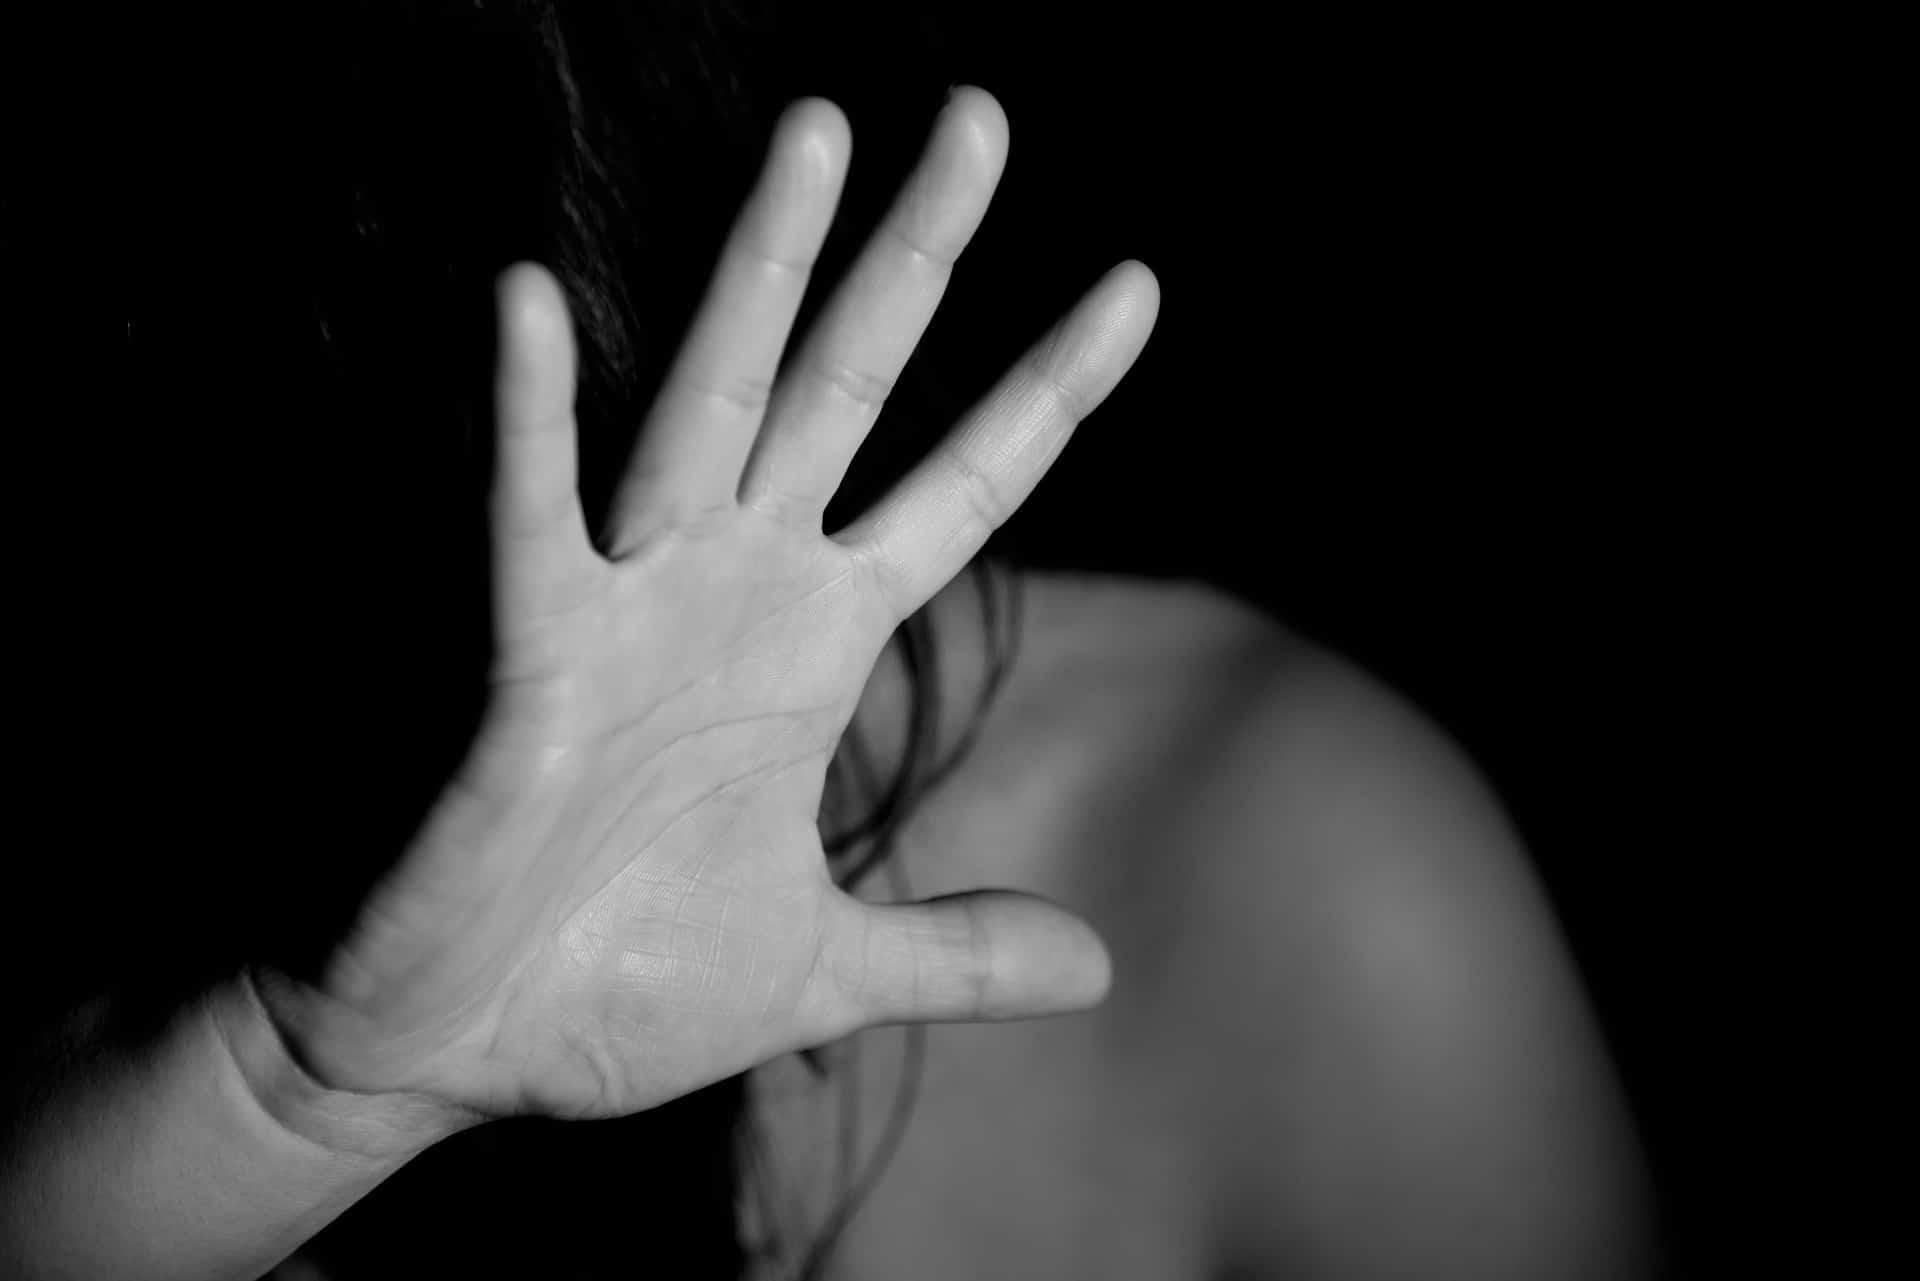 sentenza cassazione stupro donna ubriaca